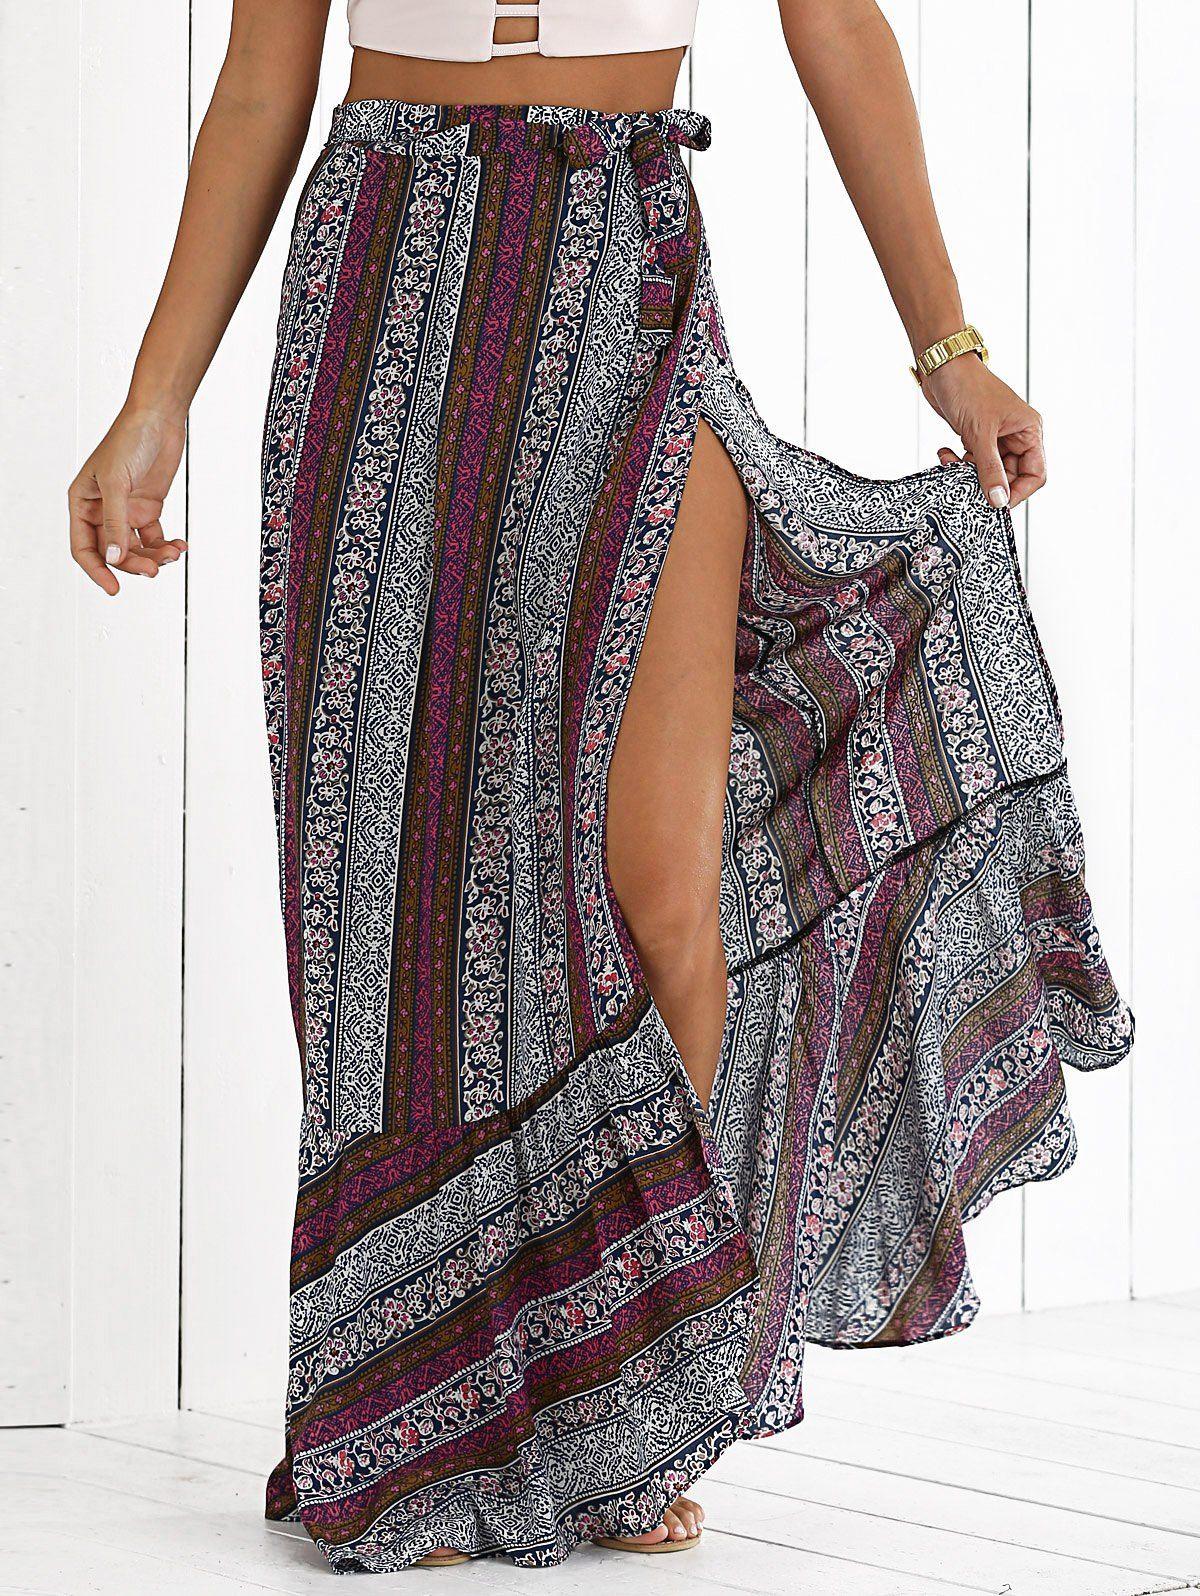 printed high slit bohemian maxi skirt habillements jupe vetement hippie chic et vetements. Black Bedroom Furniture Sets. Home Design Ideas